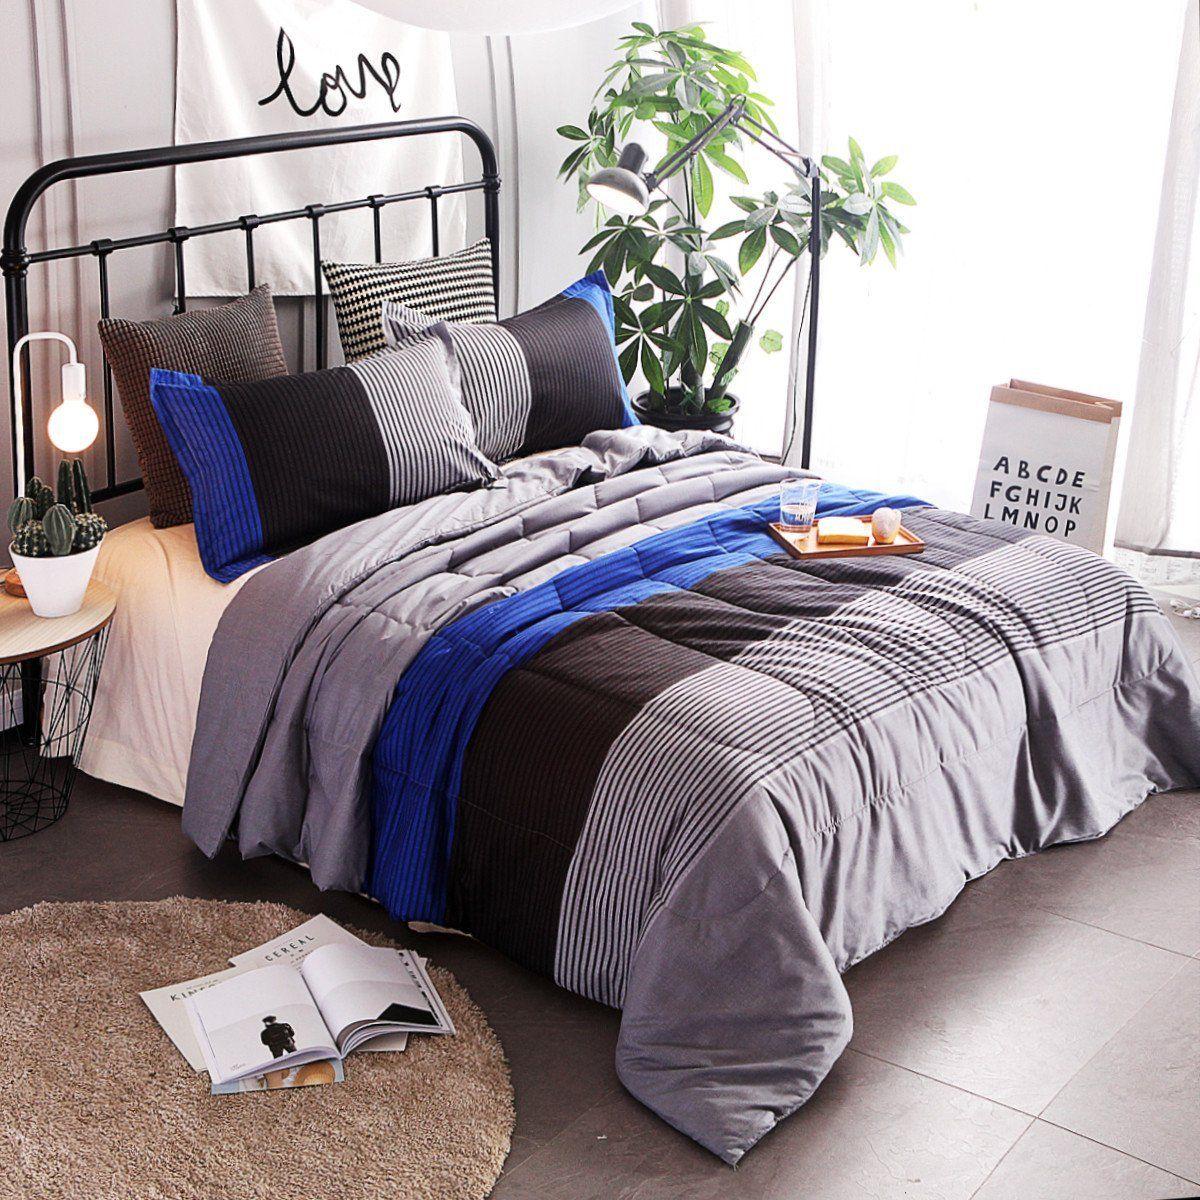 Comforter Sets Queen.Winlife 3 Piece Striped Quilt Set Boys Bedspreads Coverlet Sets Comforter Sets Queen